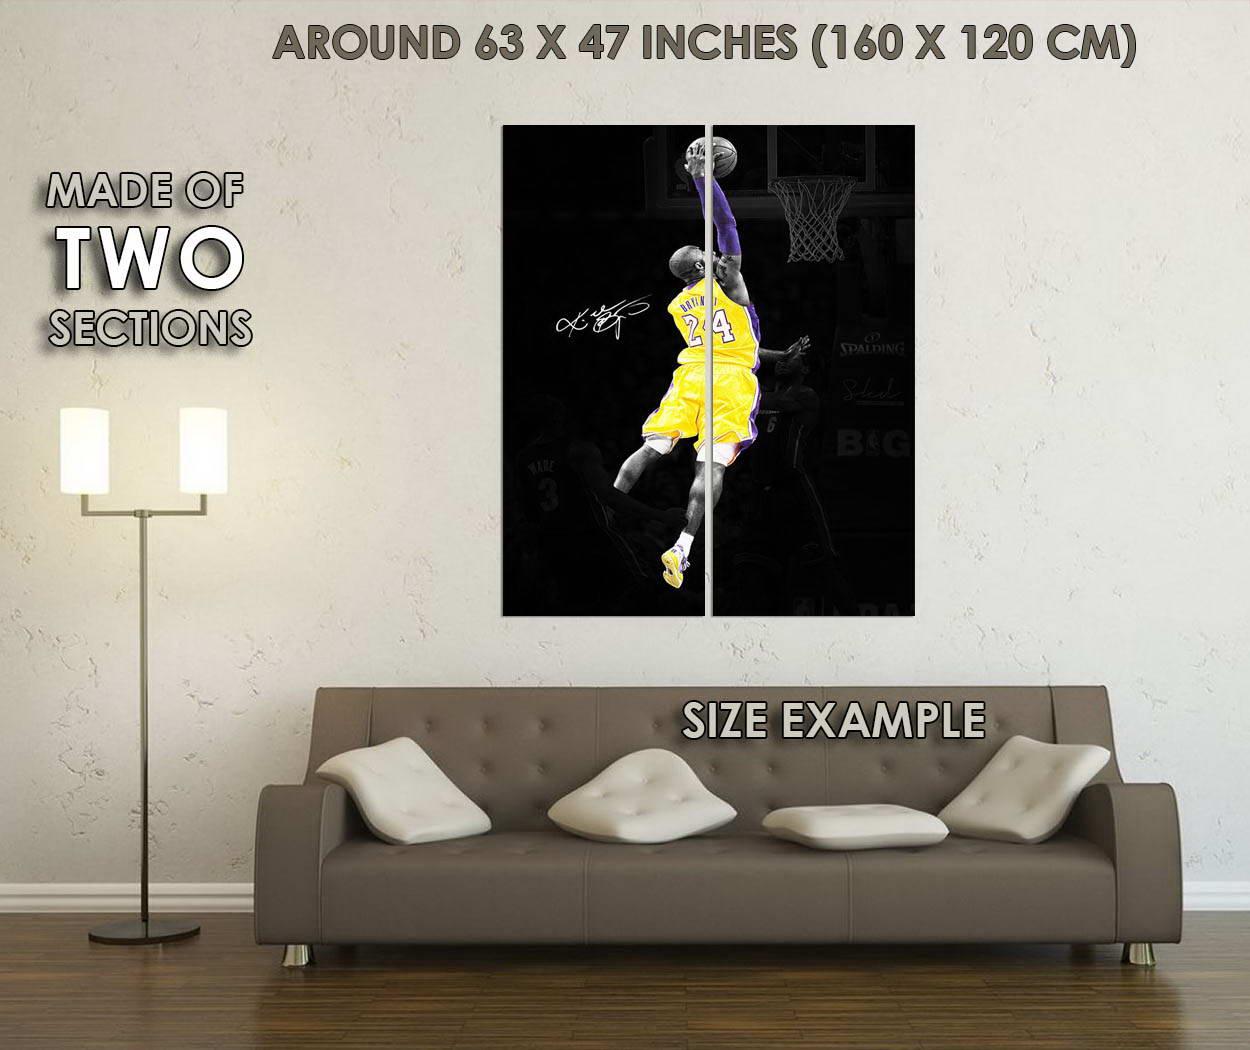 10206-Kobe-Bryant-Dunks-Basketball-Art-LAMINATED-POSTER-CA thumbnail 6